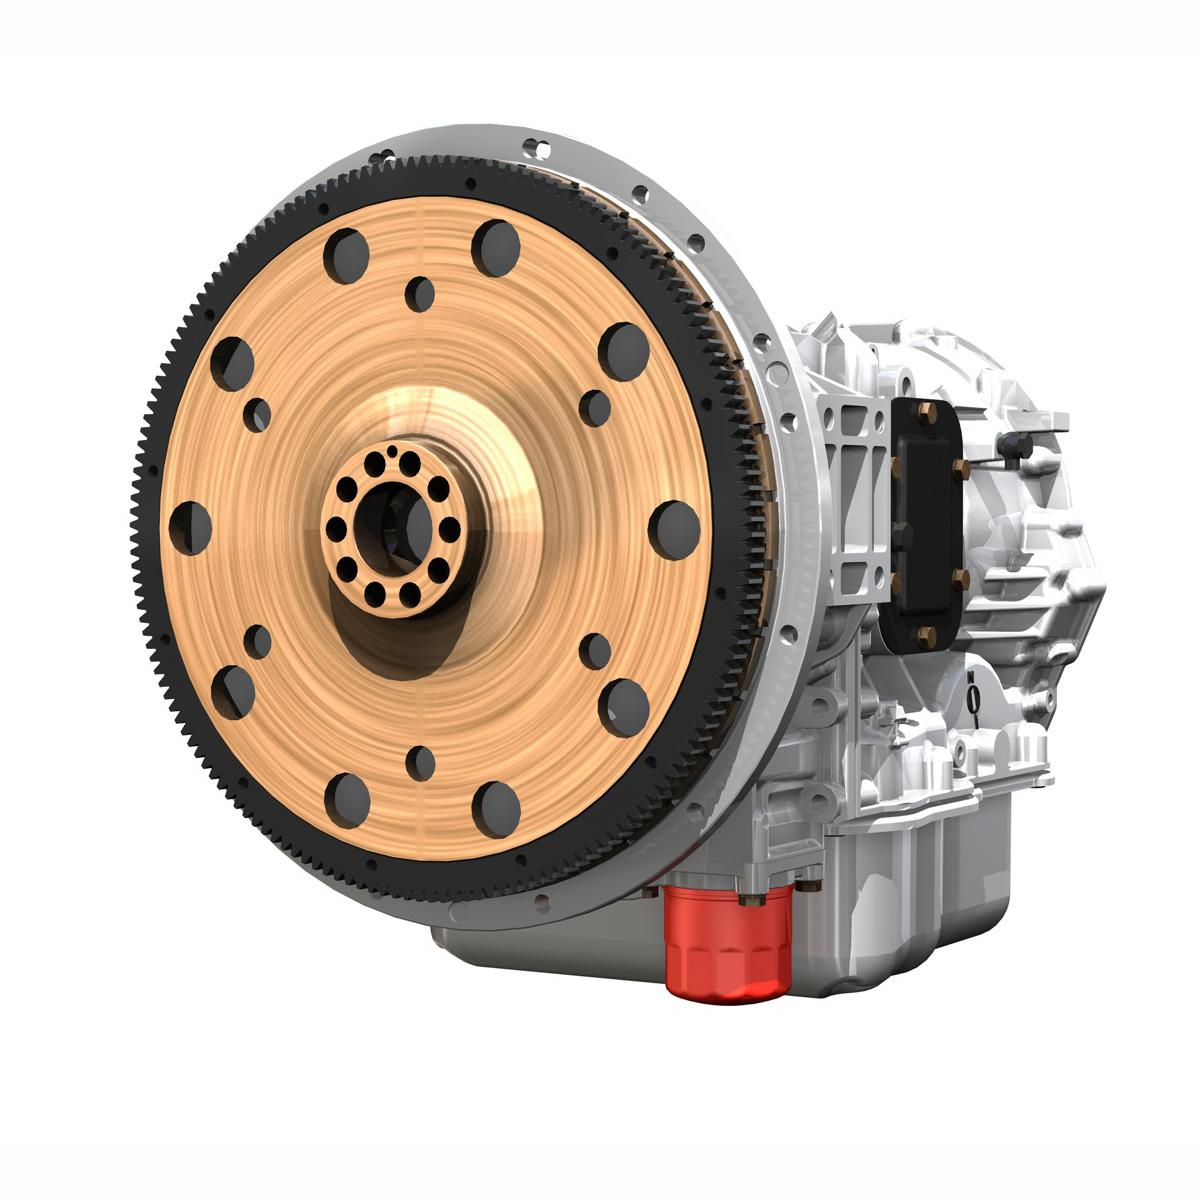 gearing – transmission 3d model 3ds fbx c4d lwo obj 189233